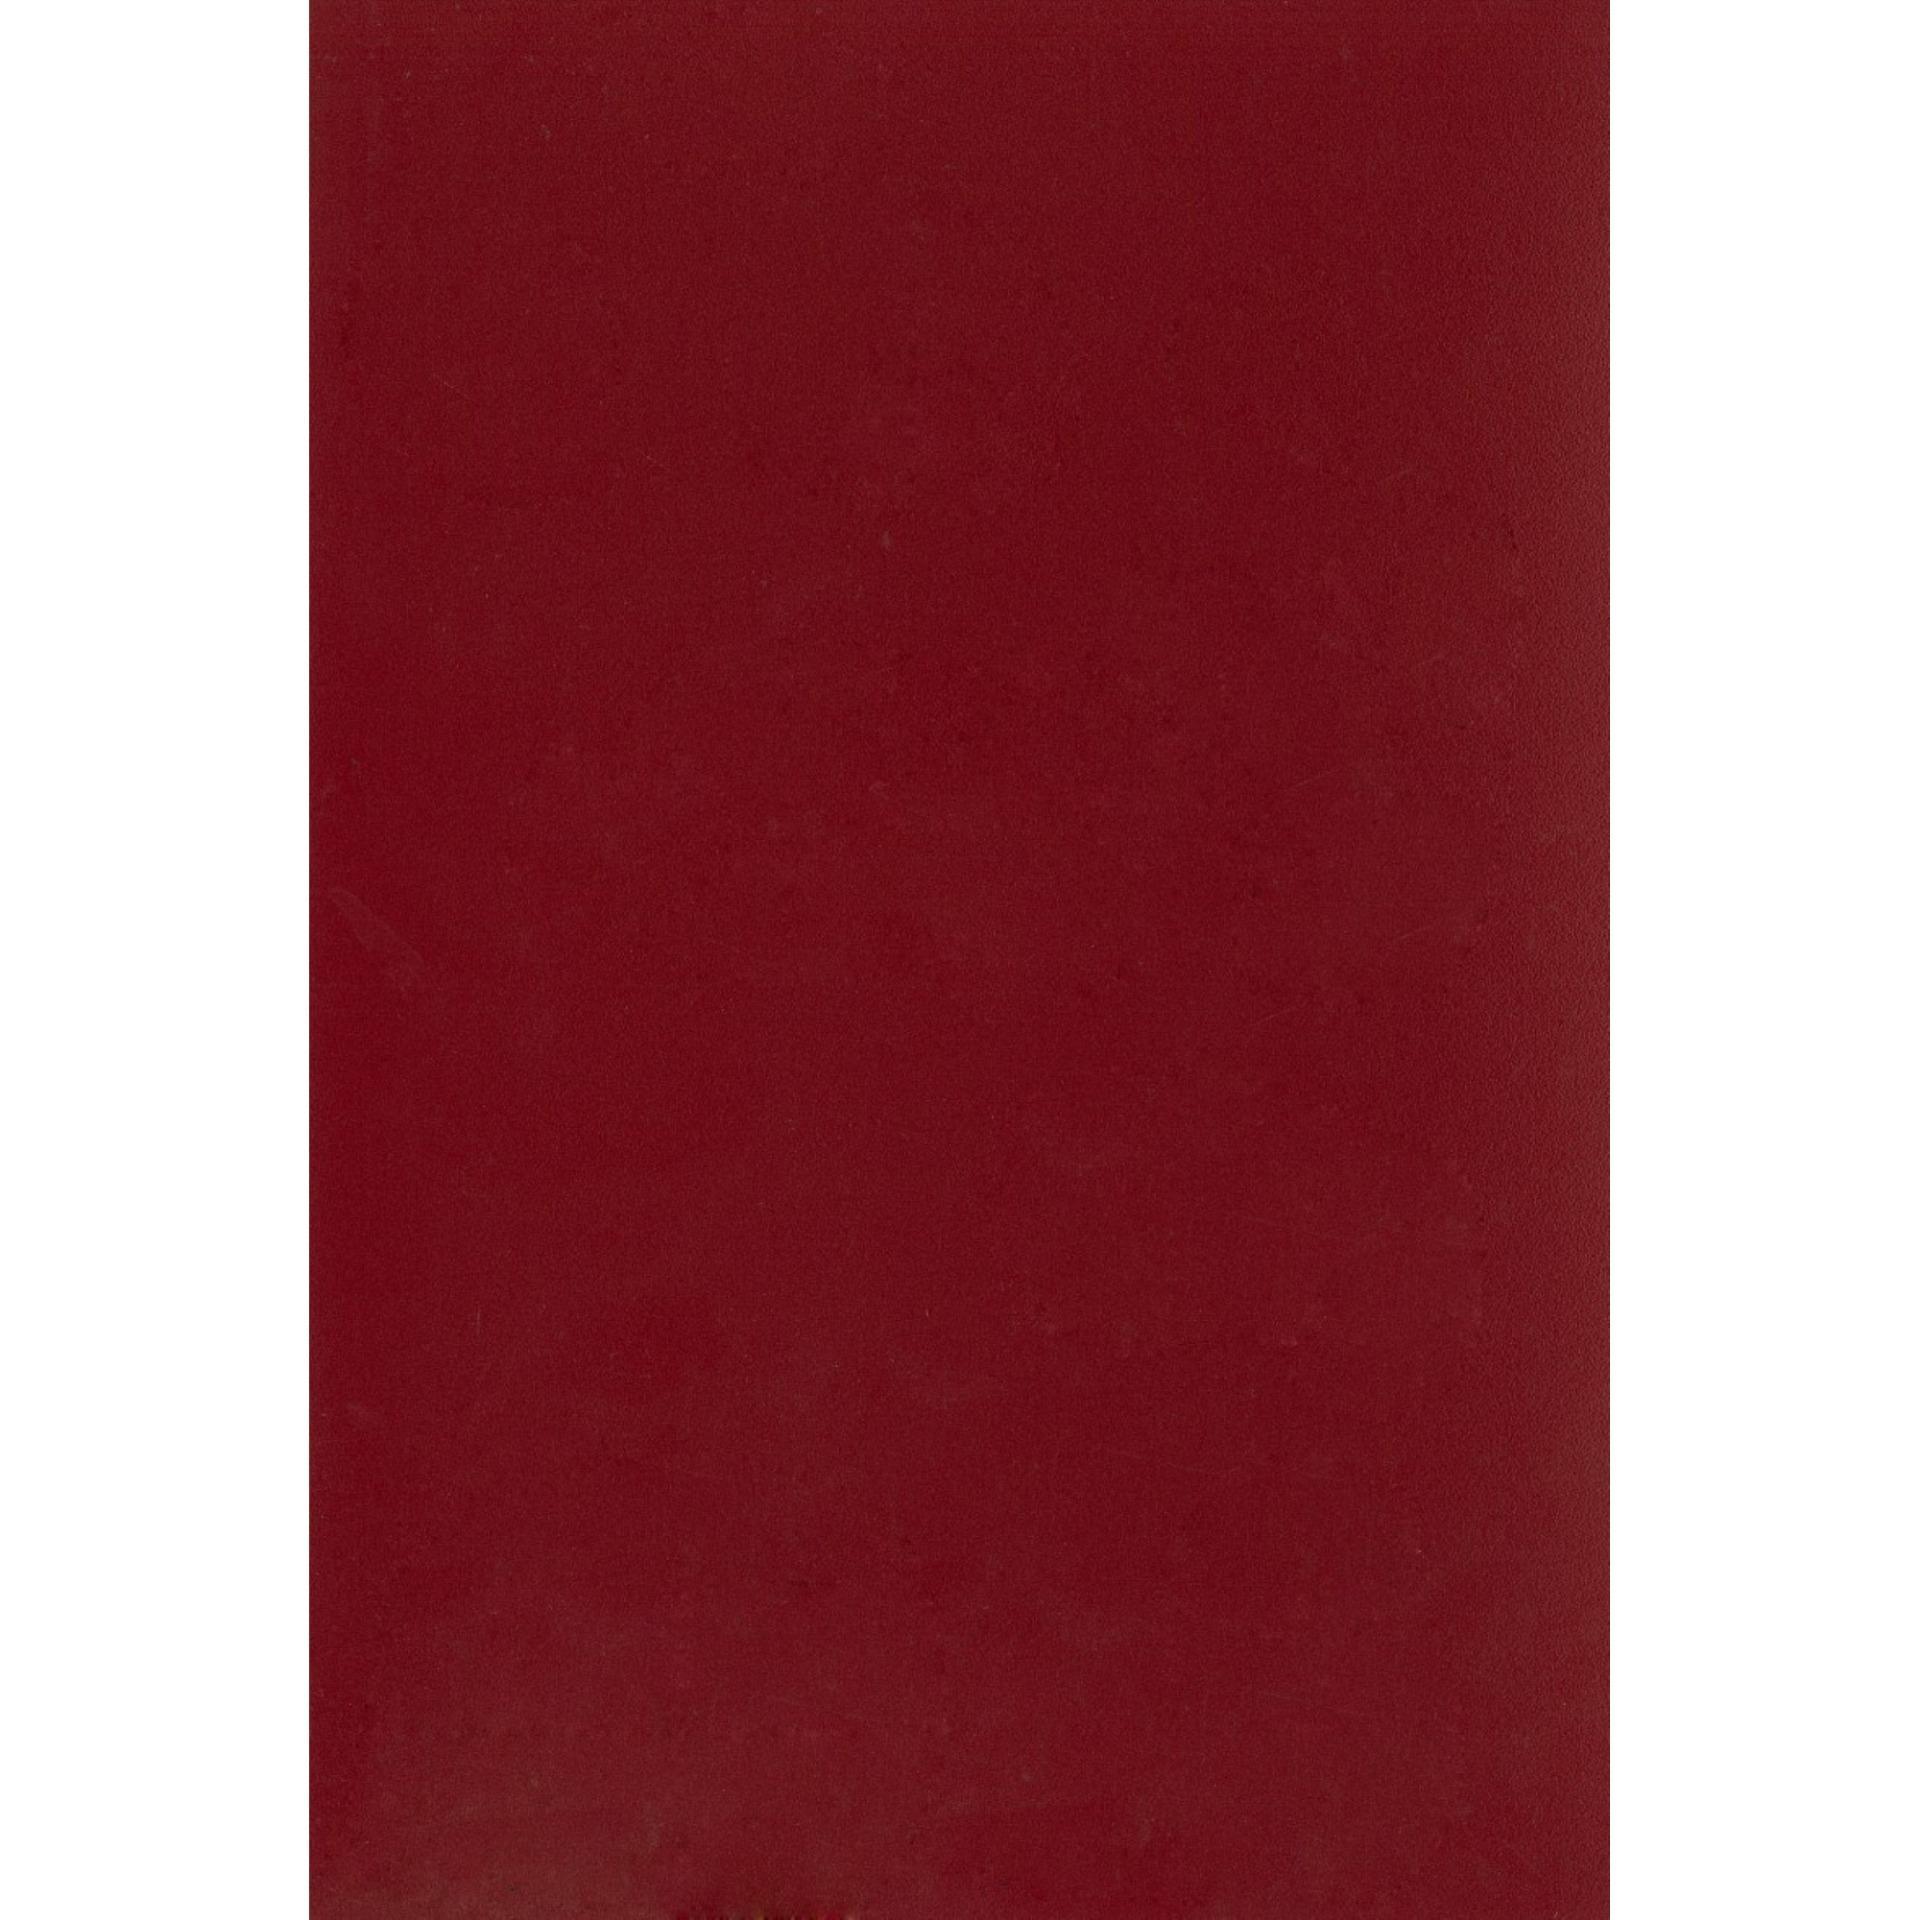 Laminate Sheets 1250 mm x 2510 mm (T) 0.7 mm  WOL-Vine